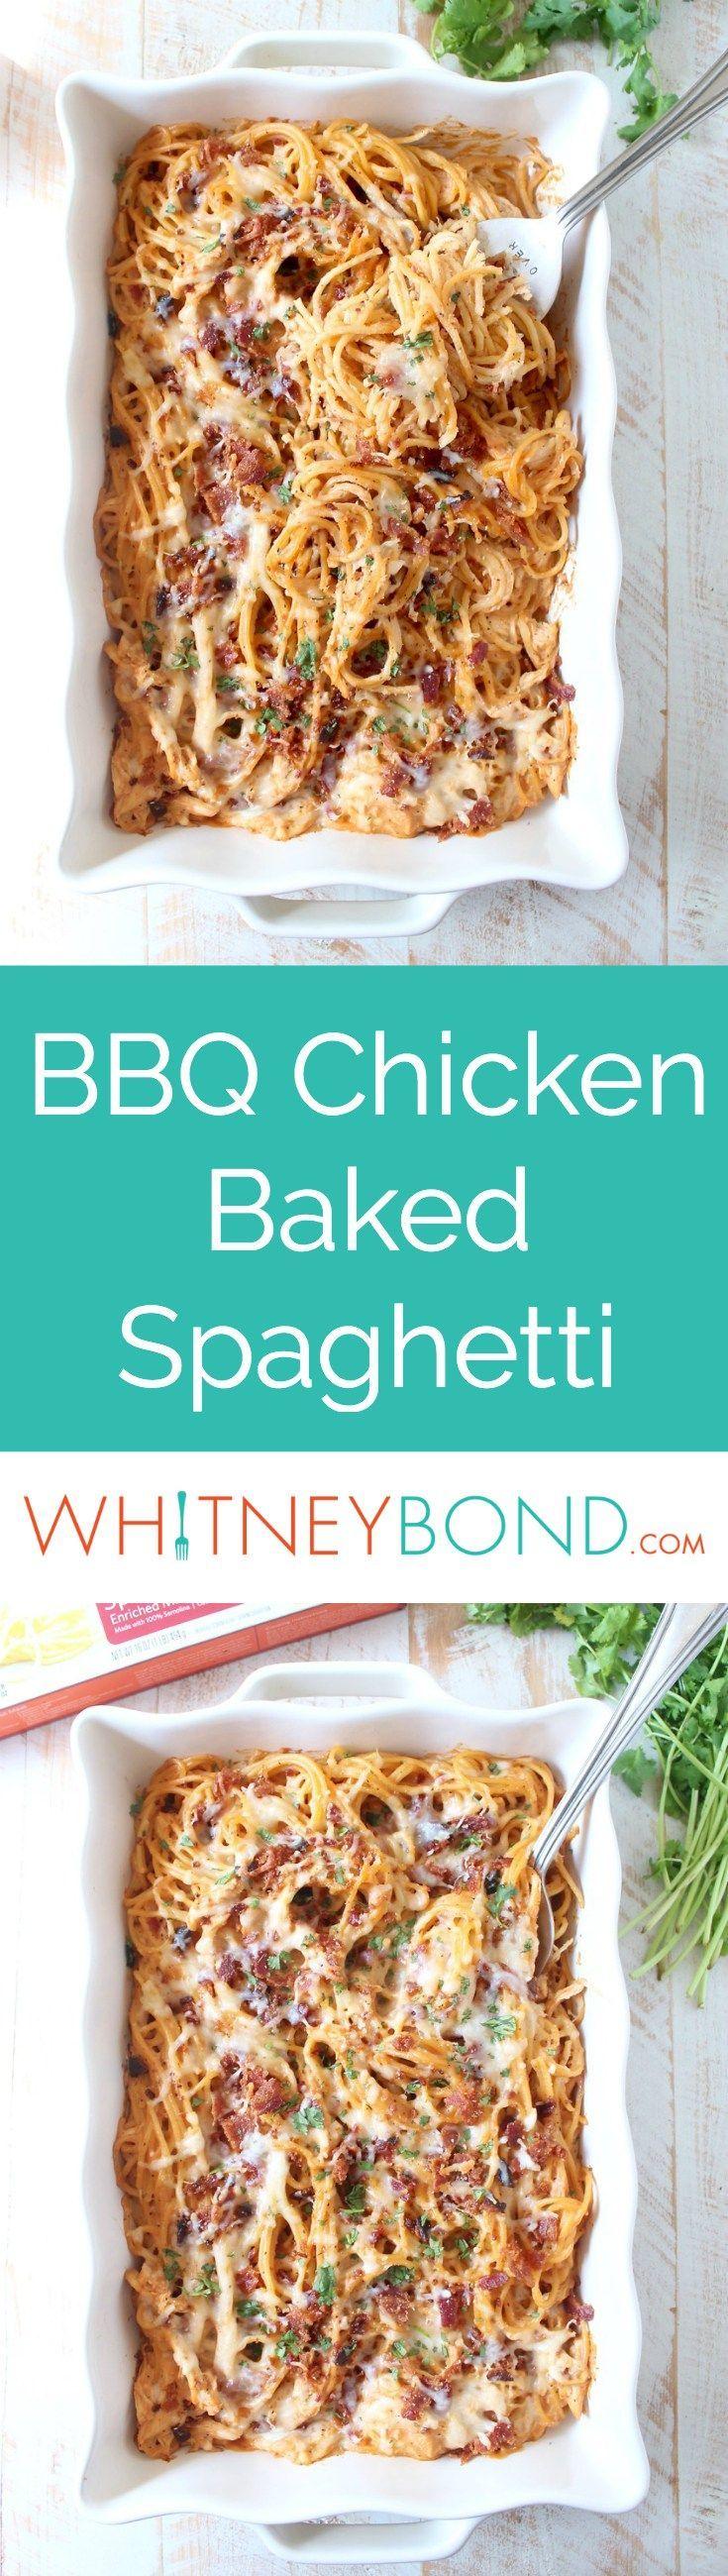 309 best pasta images on Pinterest   Cooking recipes, Vegan recipes ...